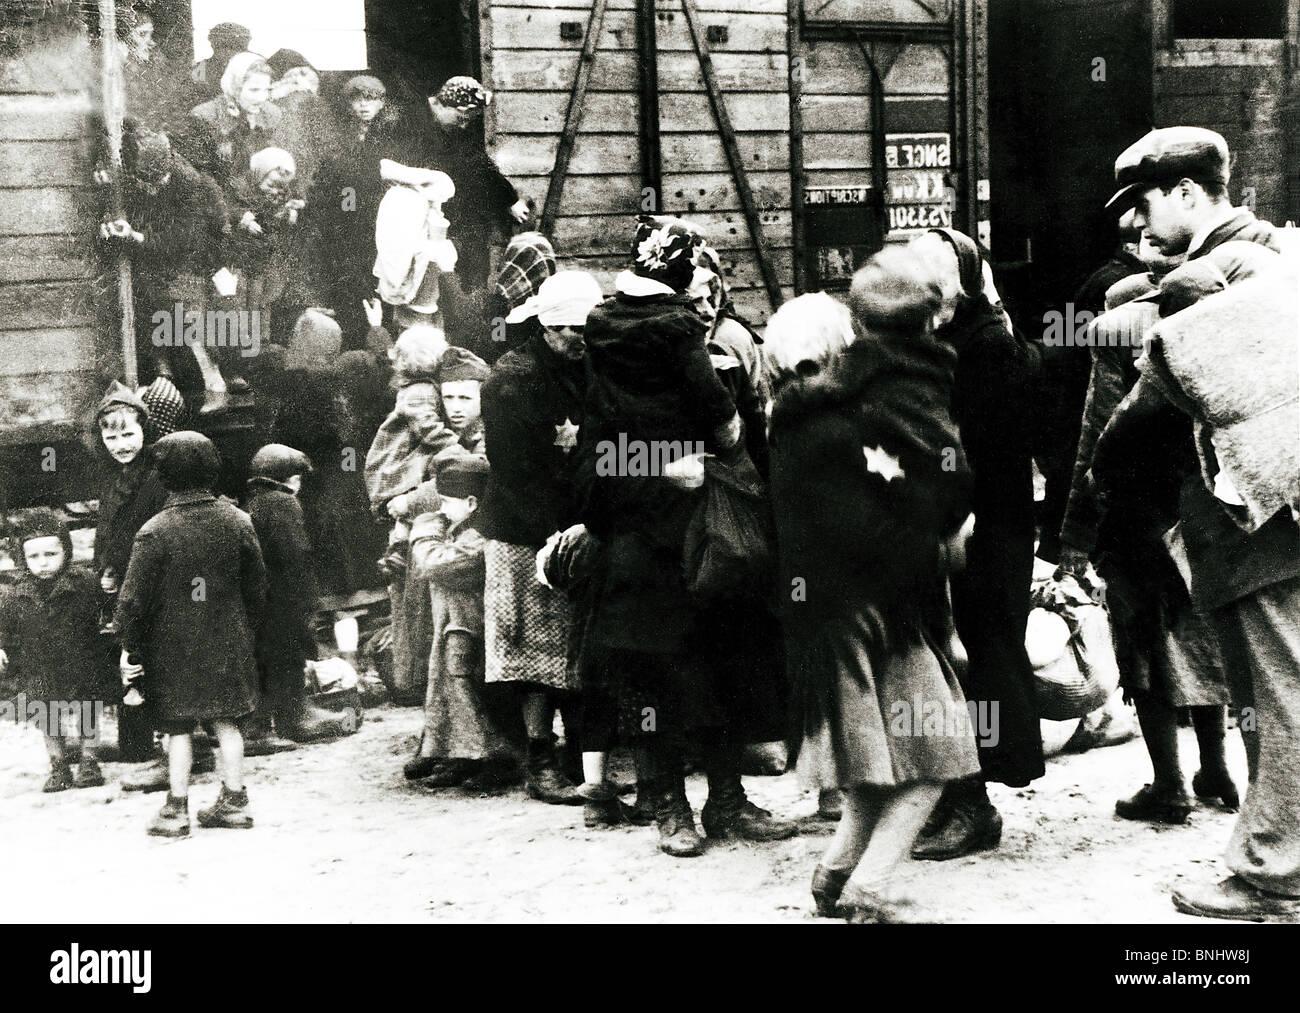 World War II Auschwitz-Birkenau concentration camp Holocaust Germany June 1944 history historical historic prisoners - Stock Image